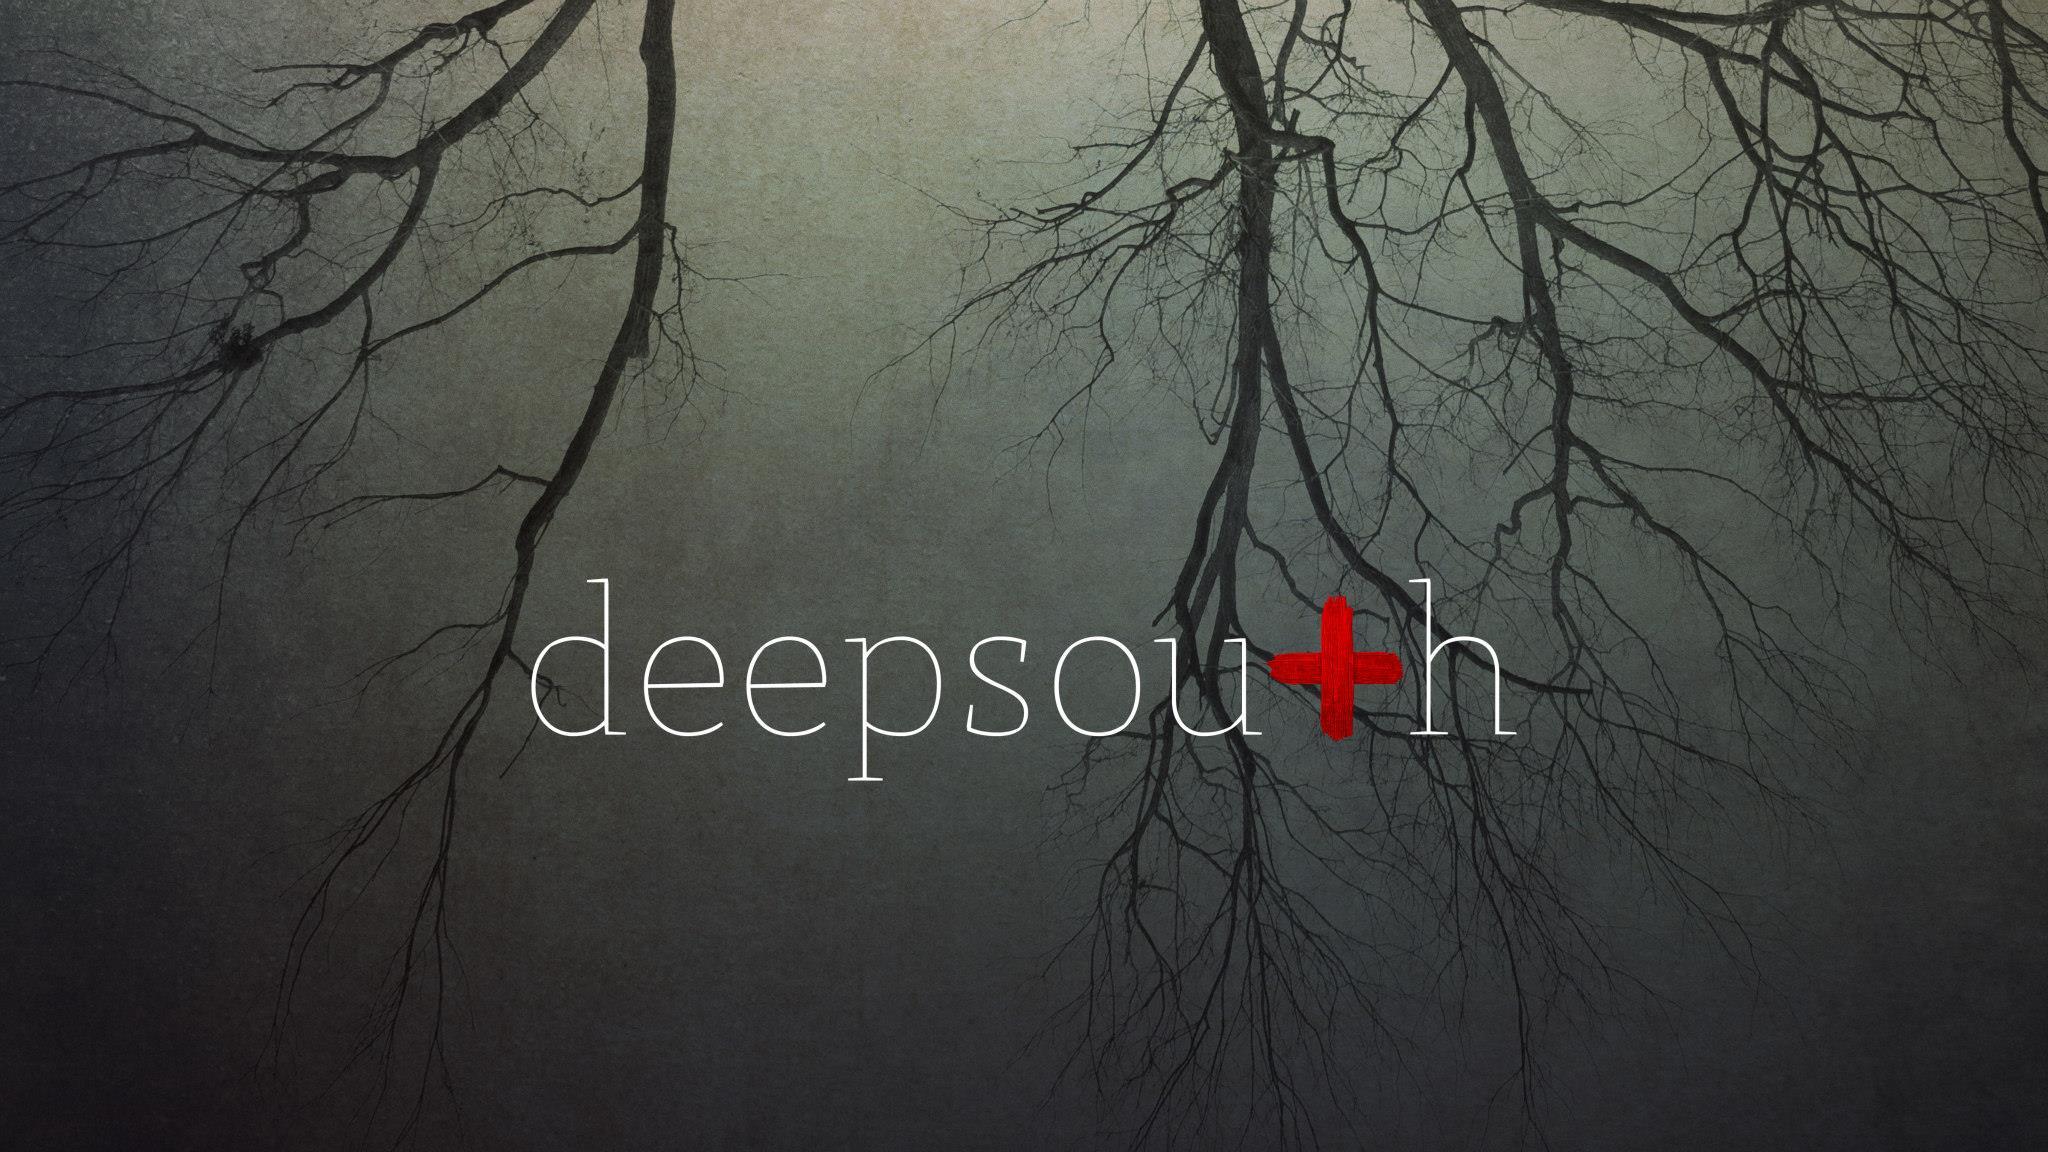 deepsouth